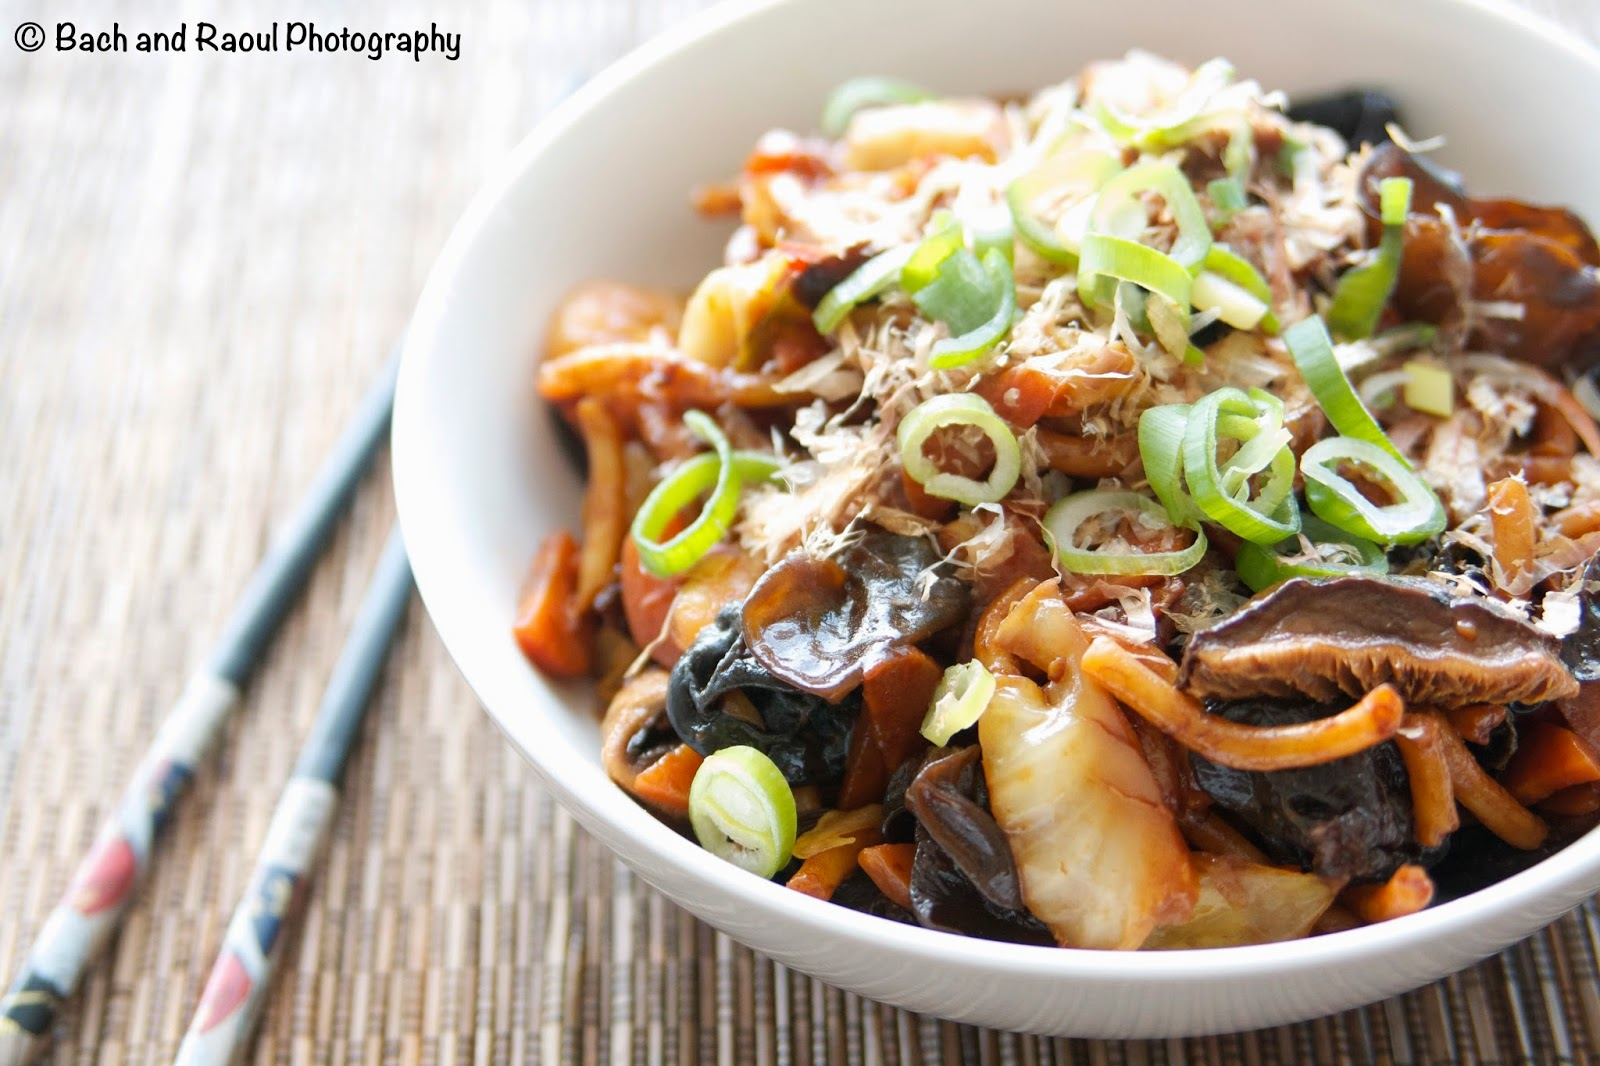 Yaki Udon - Japanese Stir Fry Noodles